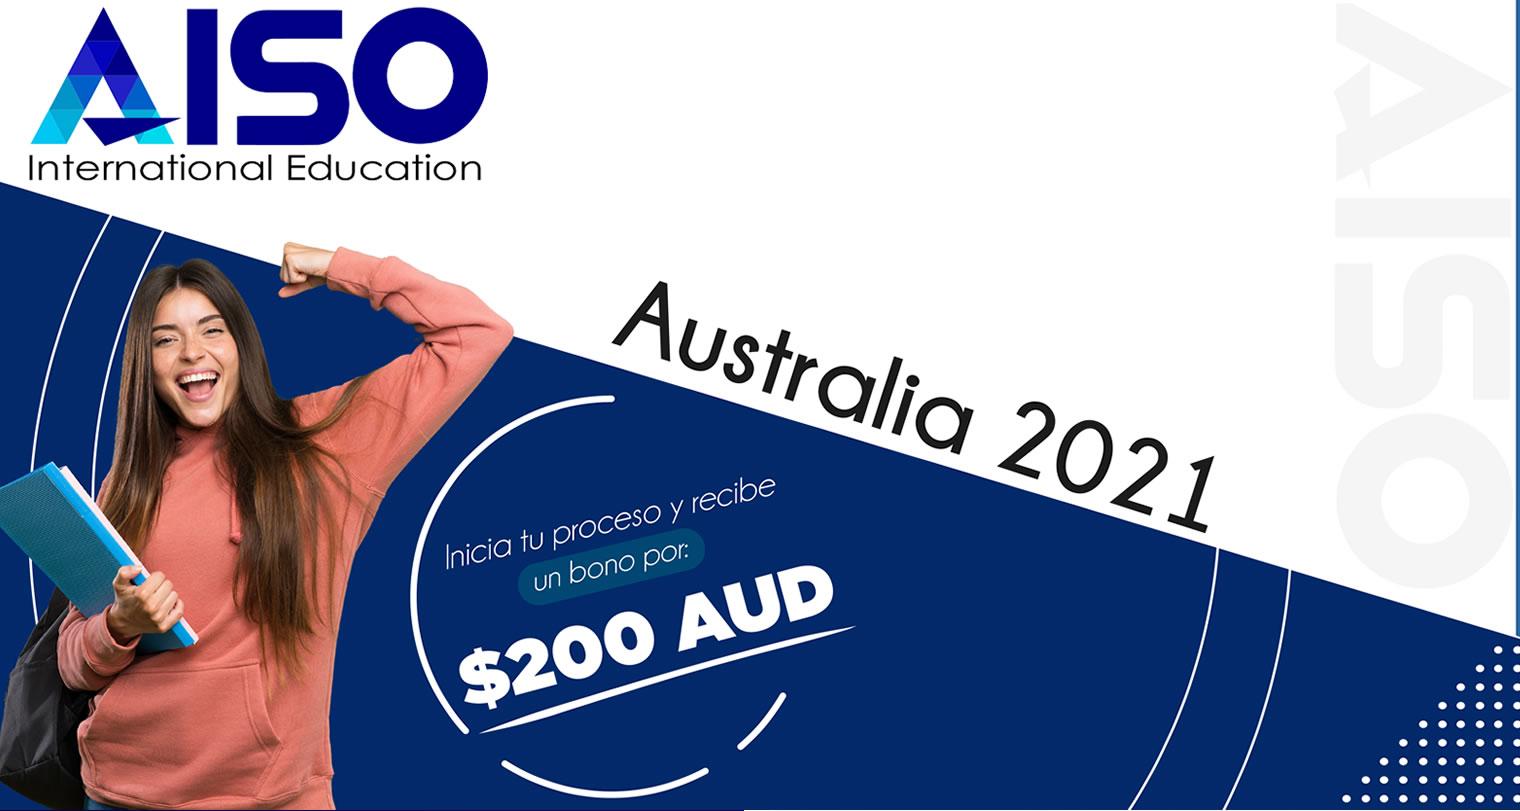 Bono $200 AUD para tu proceso de visa con AISO